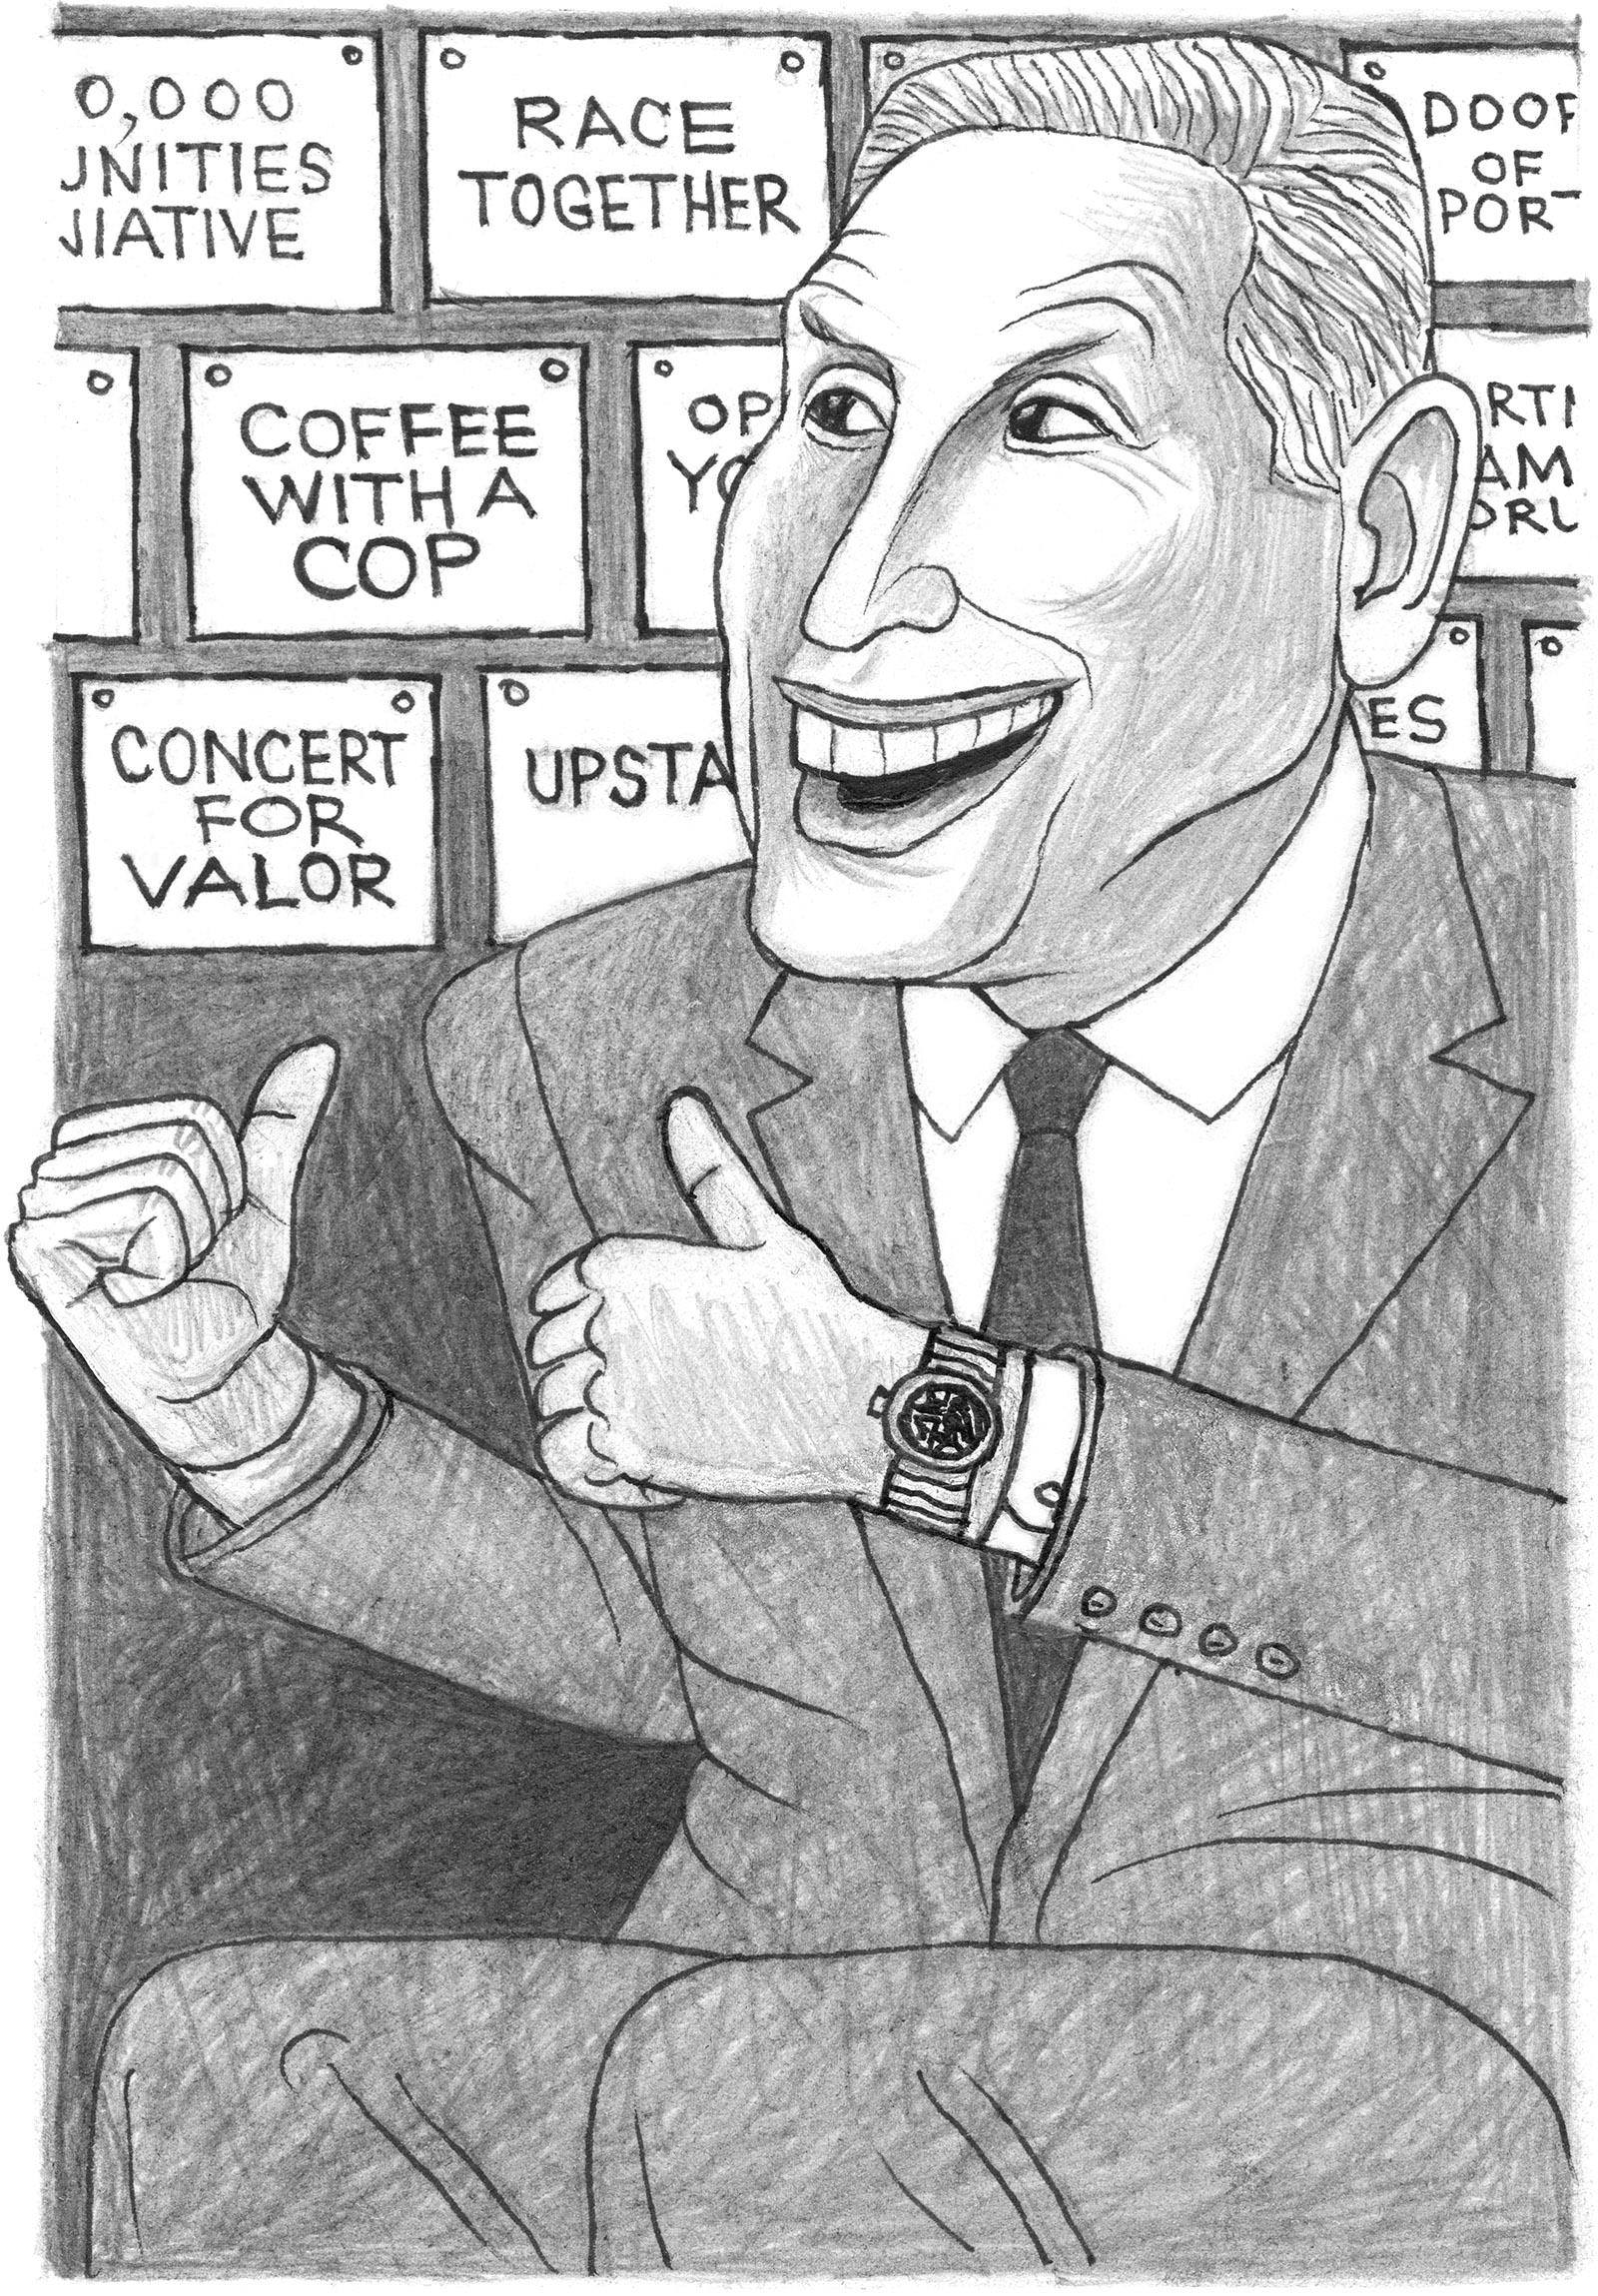 Howard Schultz; drawing by Mark Alan Stamaty